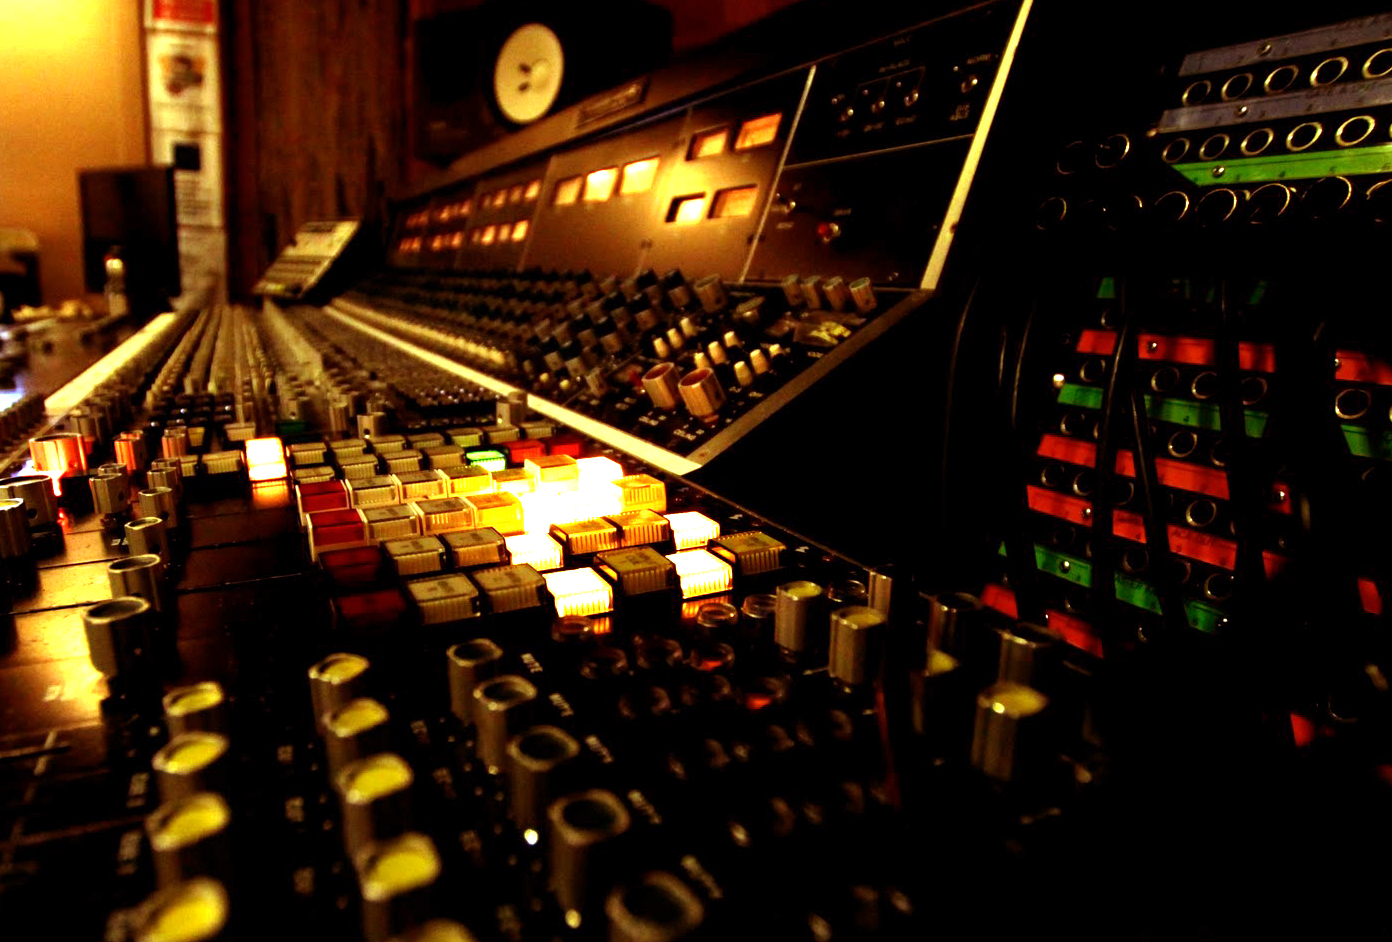 Soundboard2.jpg